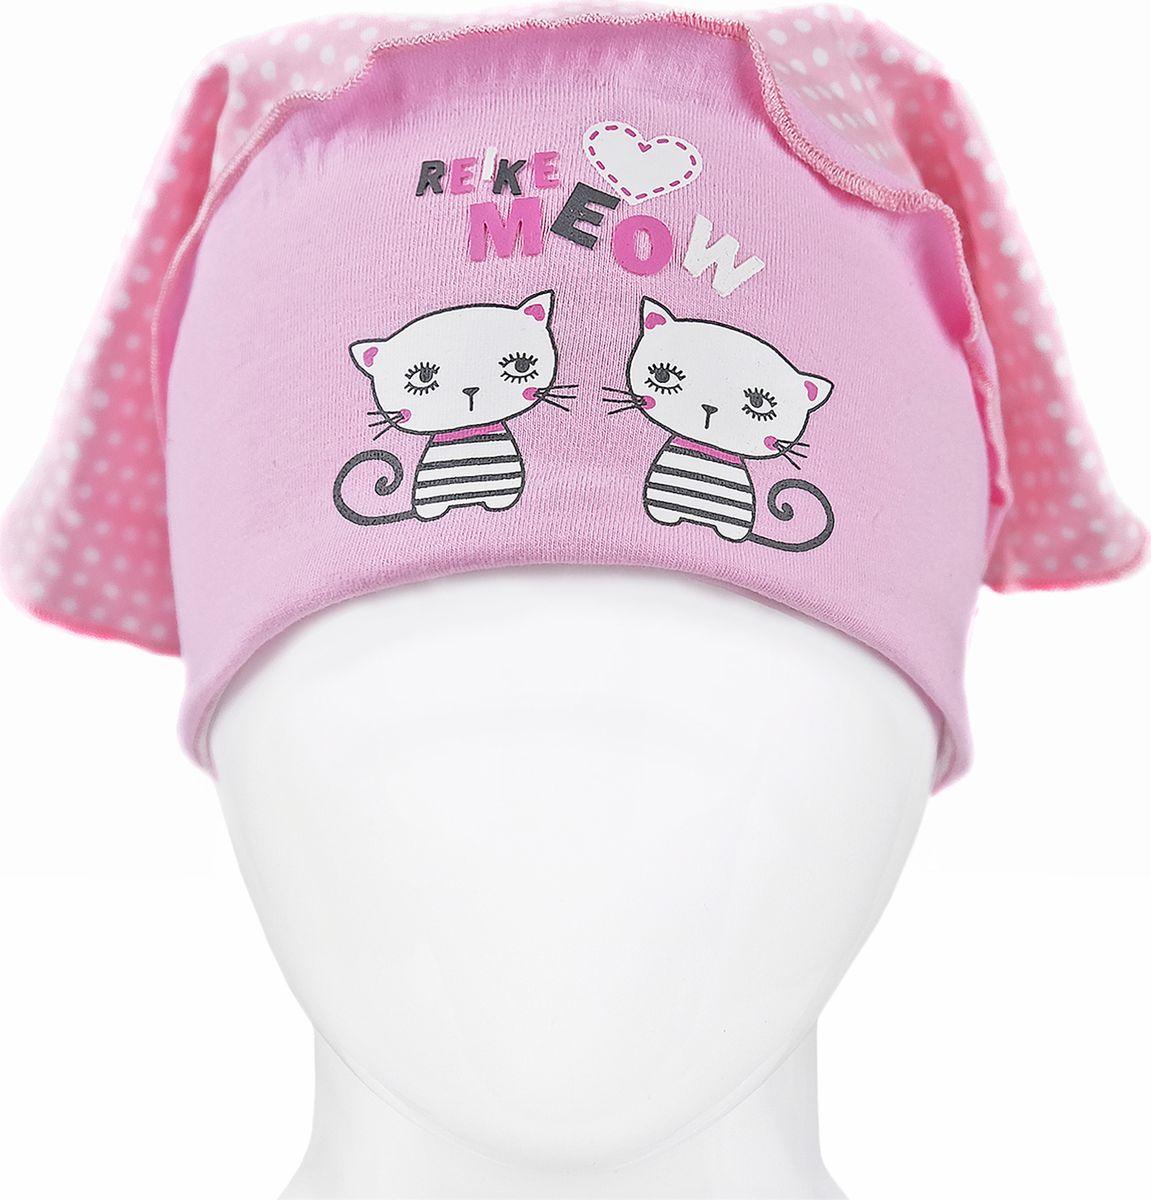 для девочки Reike, цвет: розовый. RKNSS18_CATS-6 pink р.50. Размер 50